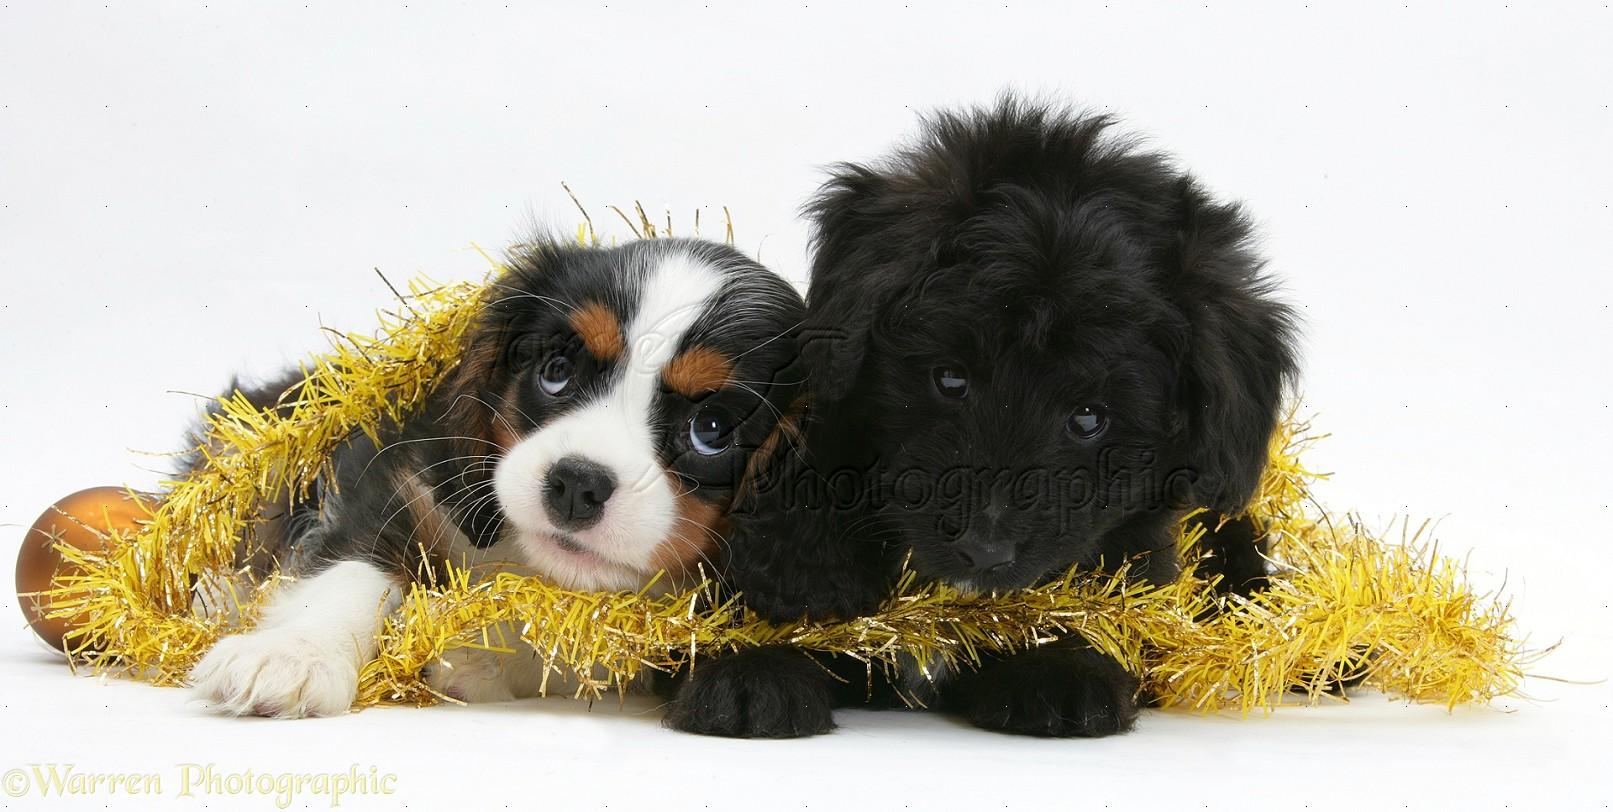 Poodle Christmas Decorations